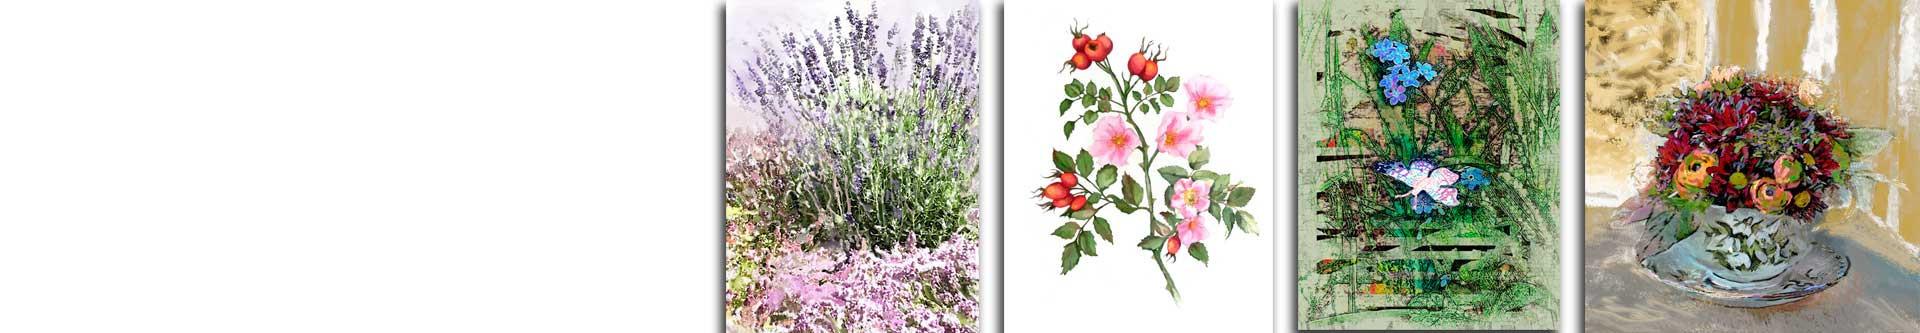 Obrazy z roślinami Botanika - obrazy botaniczne • Grafiki Obrazy